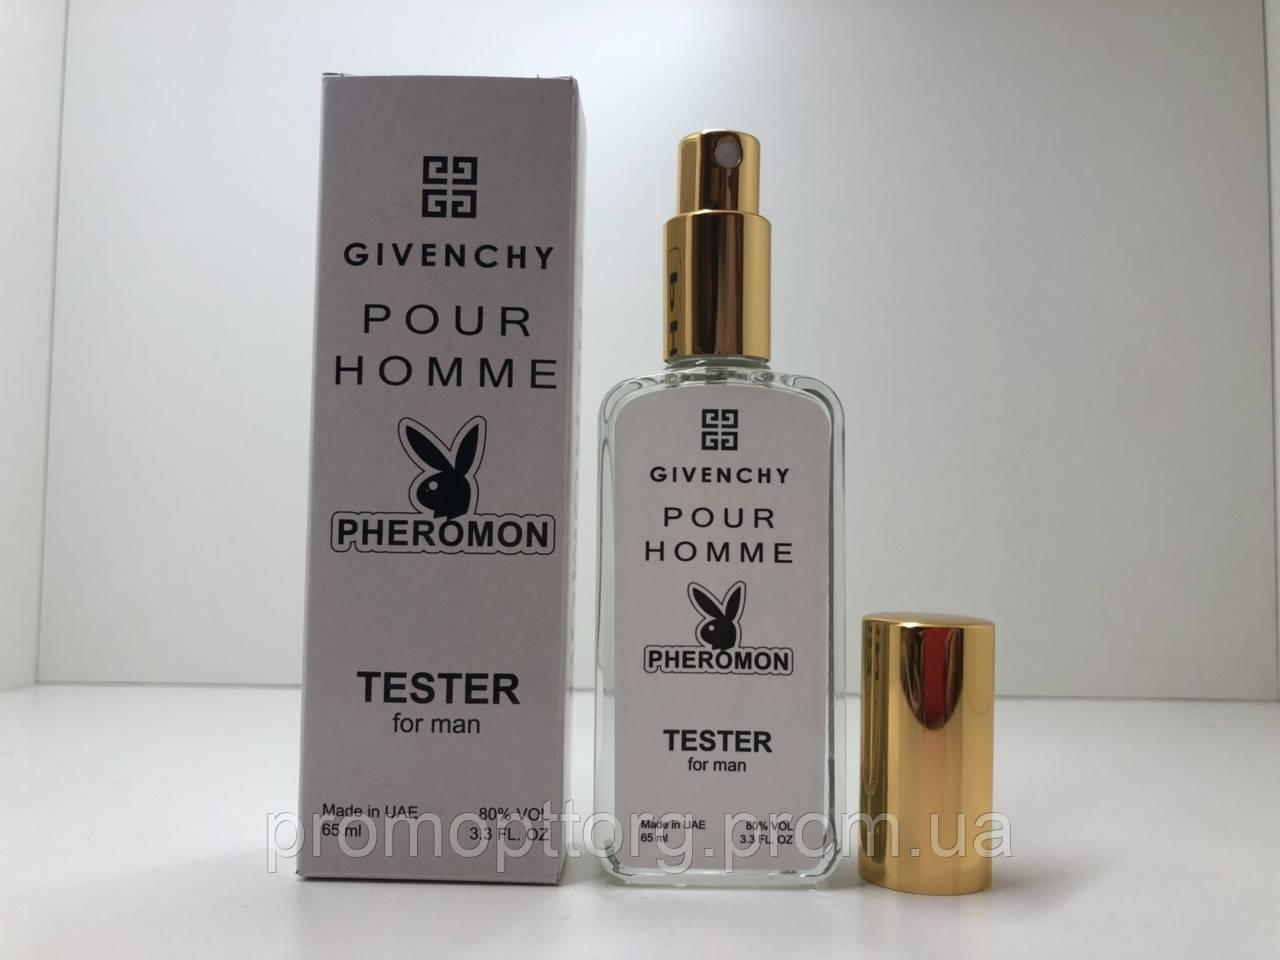 Givenchy pour Homme мужской парфюм тестер 65 ml с феромонами ОАЭ(реплика)